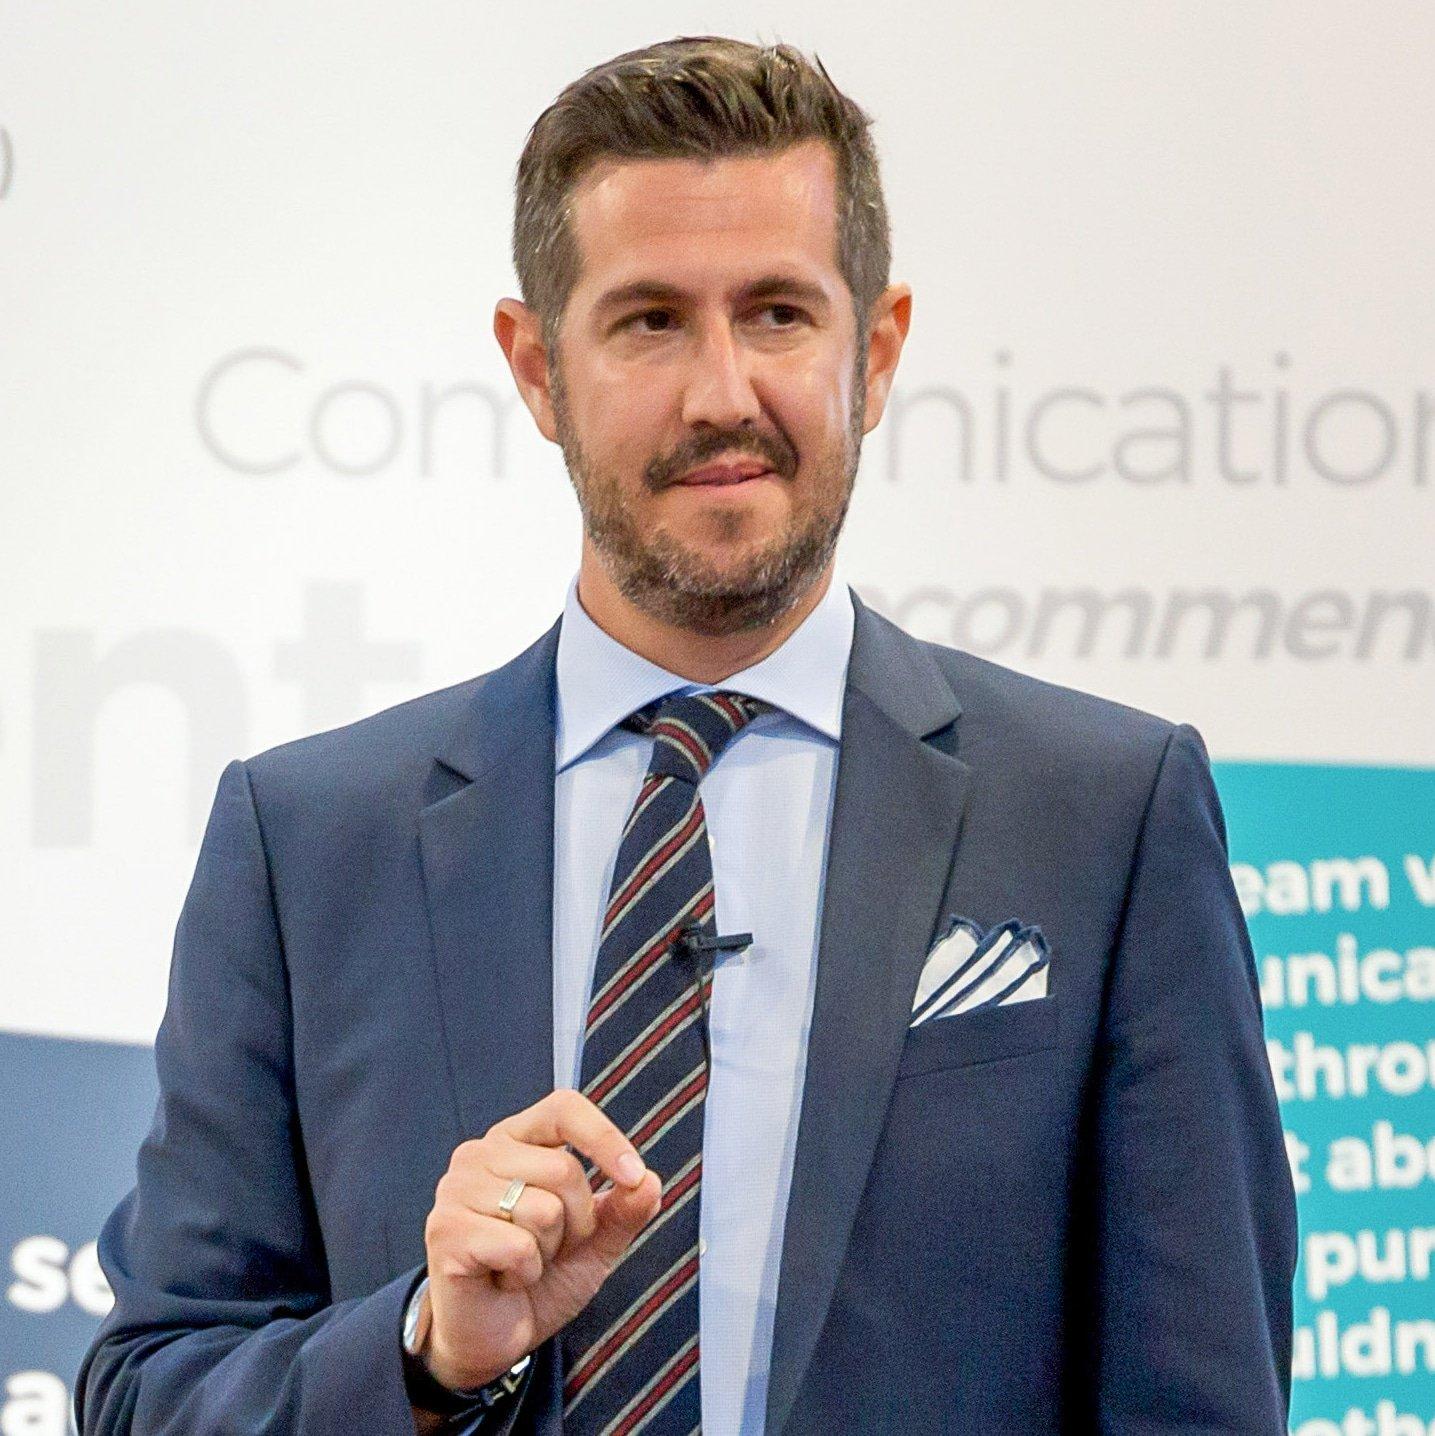 Tony-Morris-Killer-Sales-expert-speaker-writer-workshop-coach-at-Great-British-Speakers